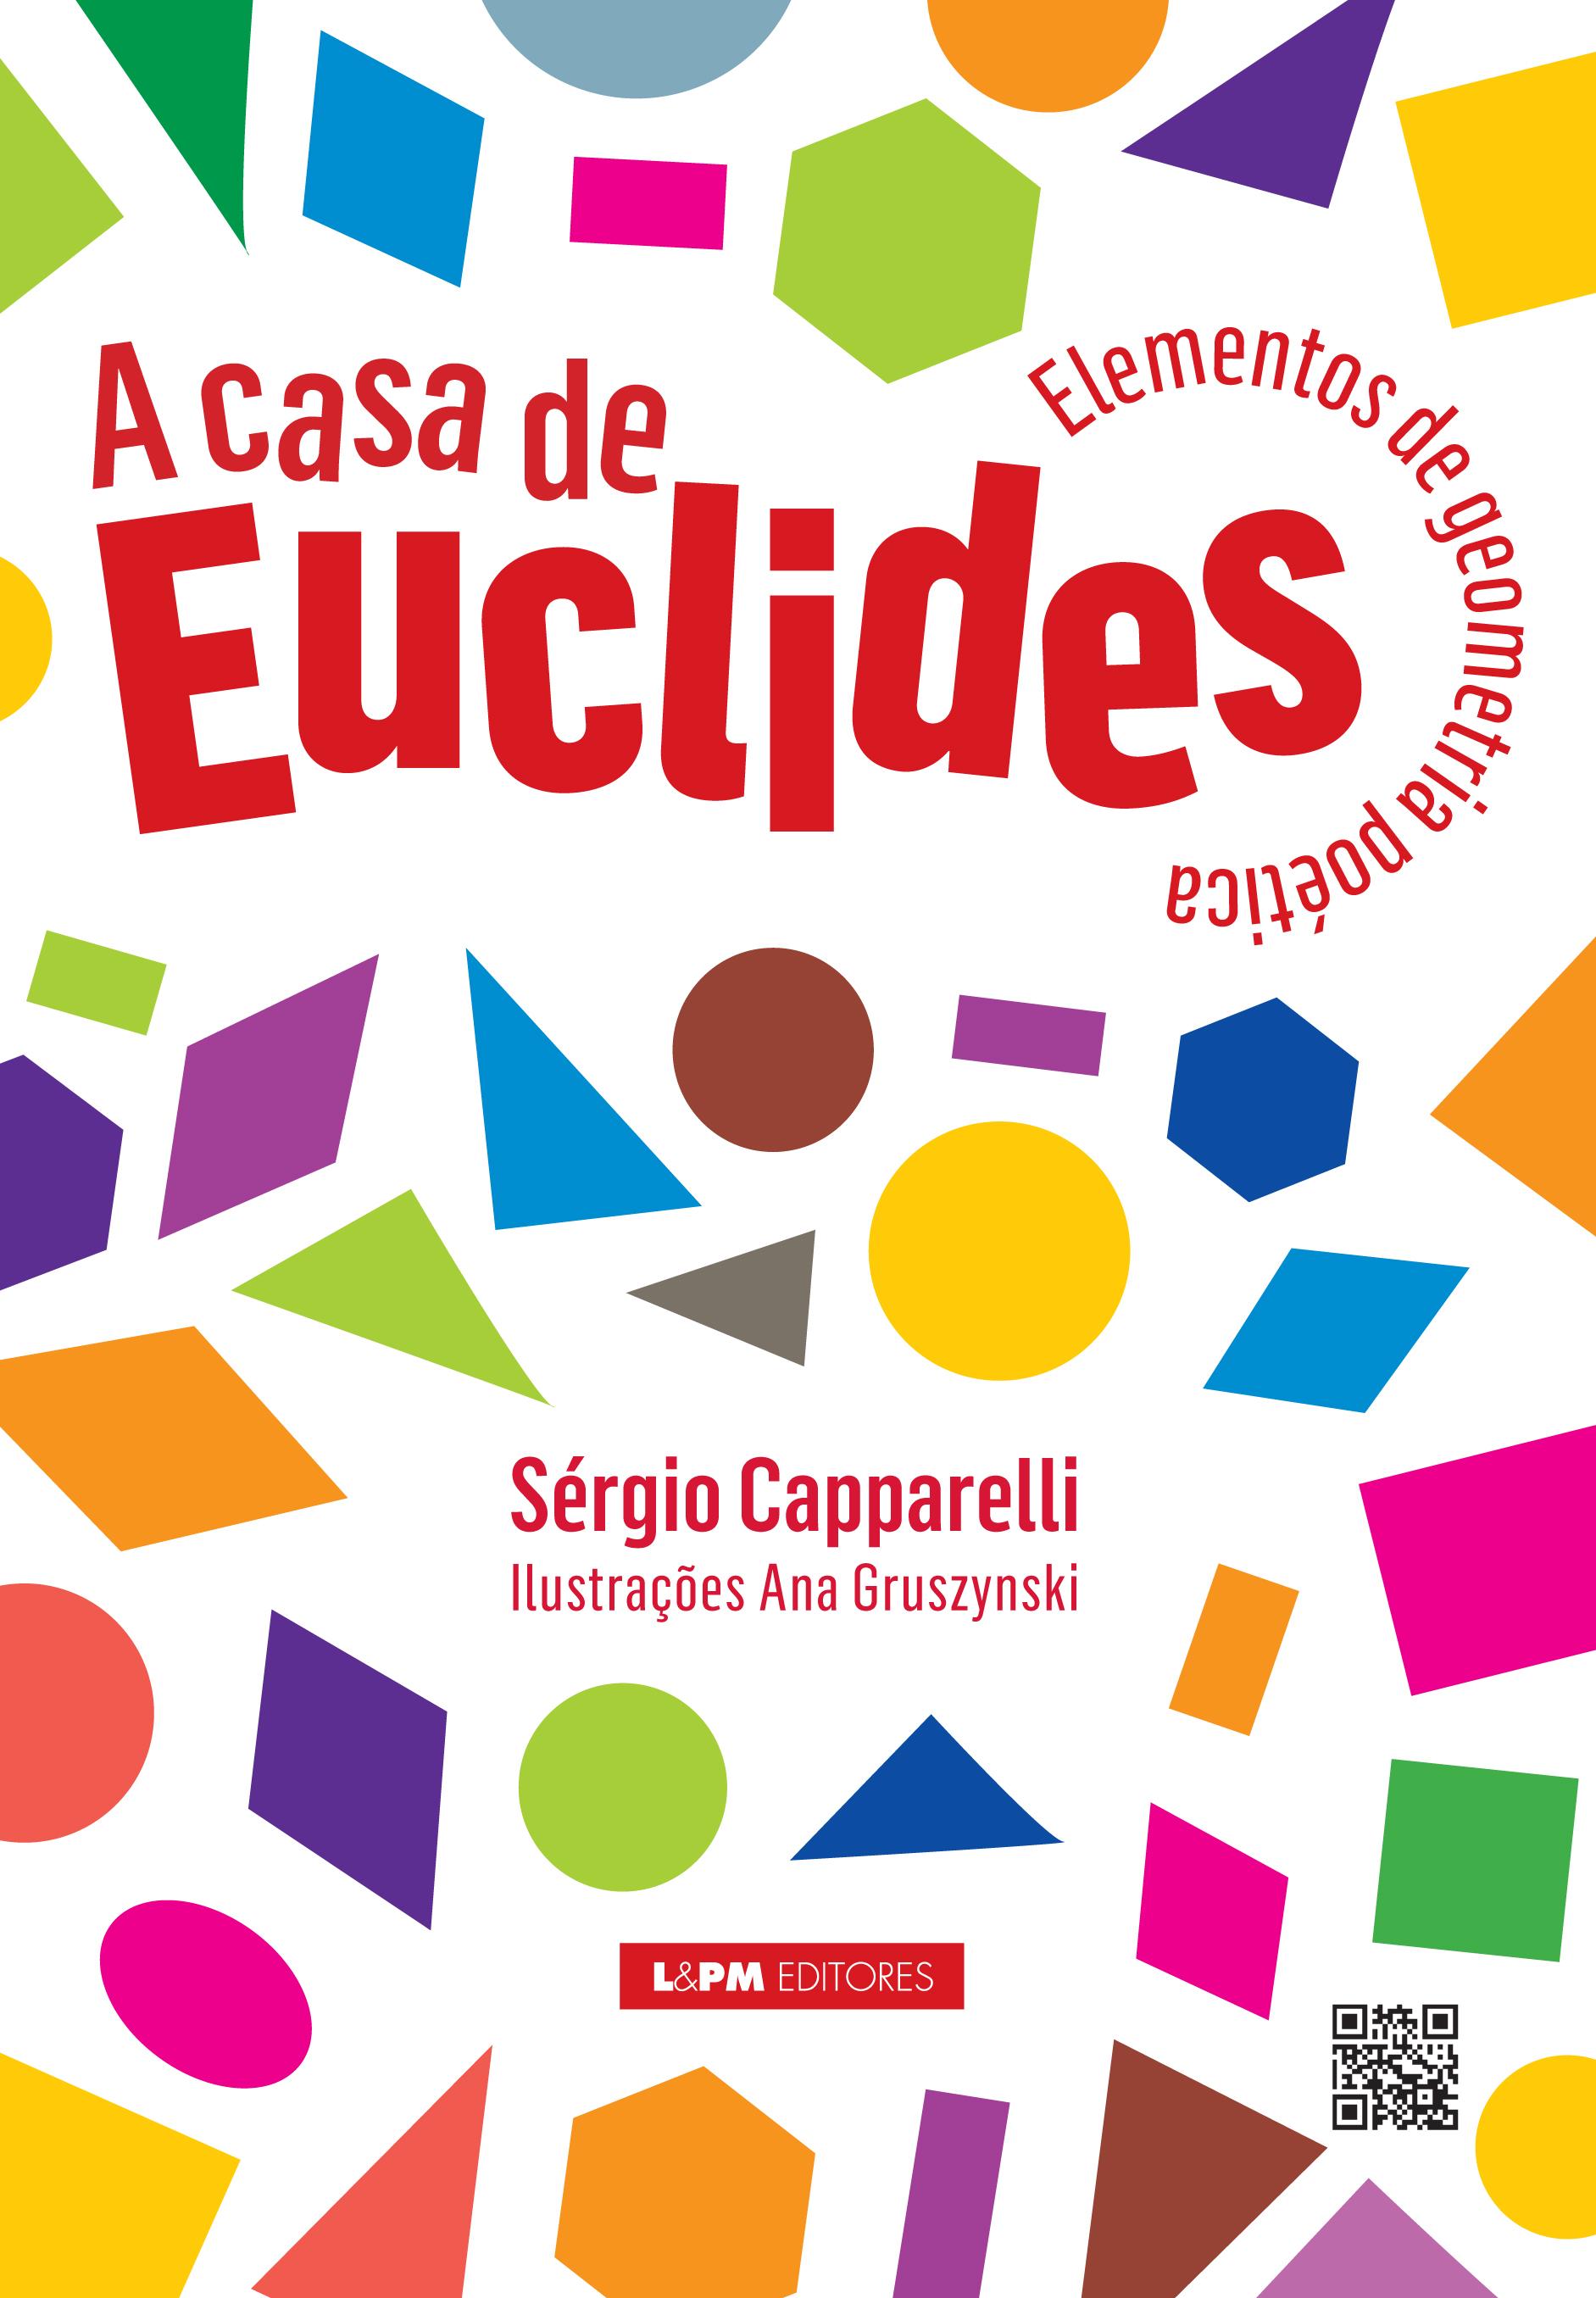 capa_casa.de.euclides_24.06.2013.indd